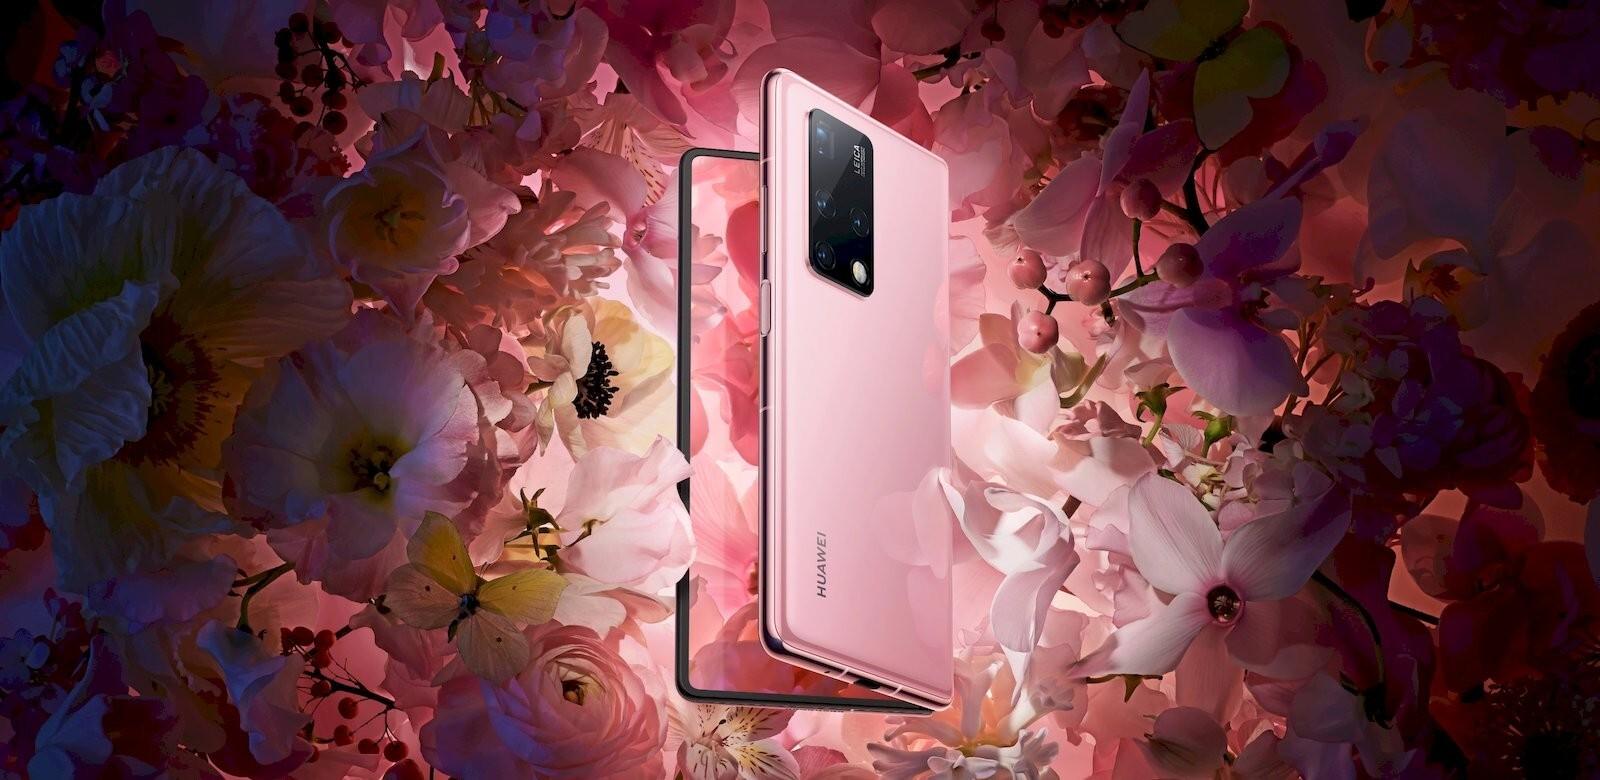 Huawei представила новый гибкий смартфон за 200 тысяч рублей